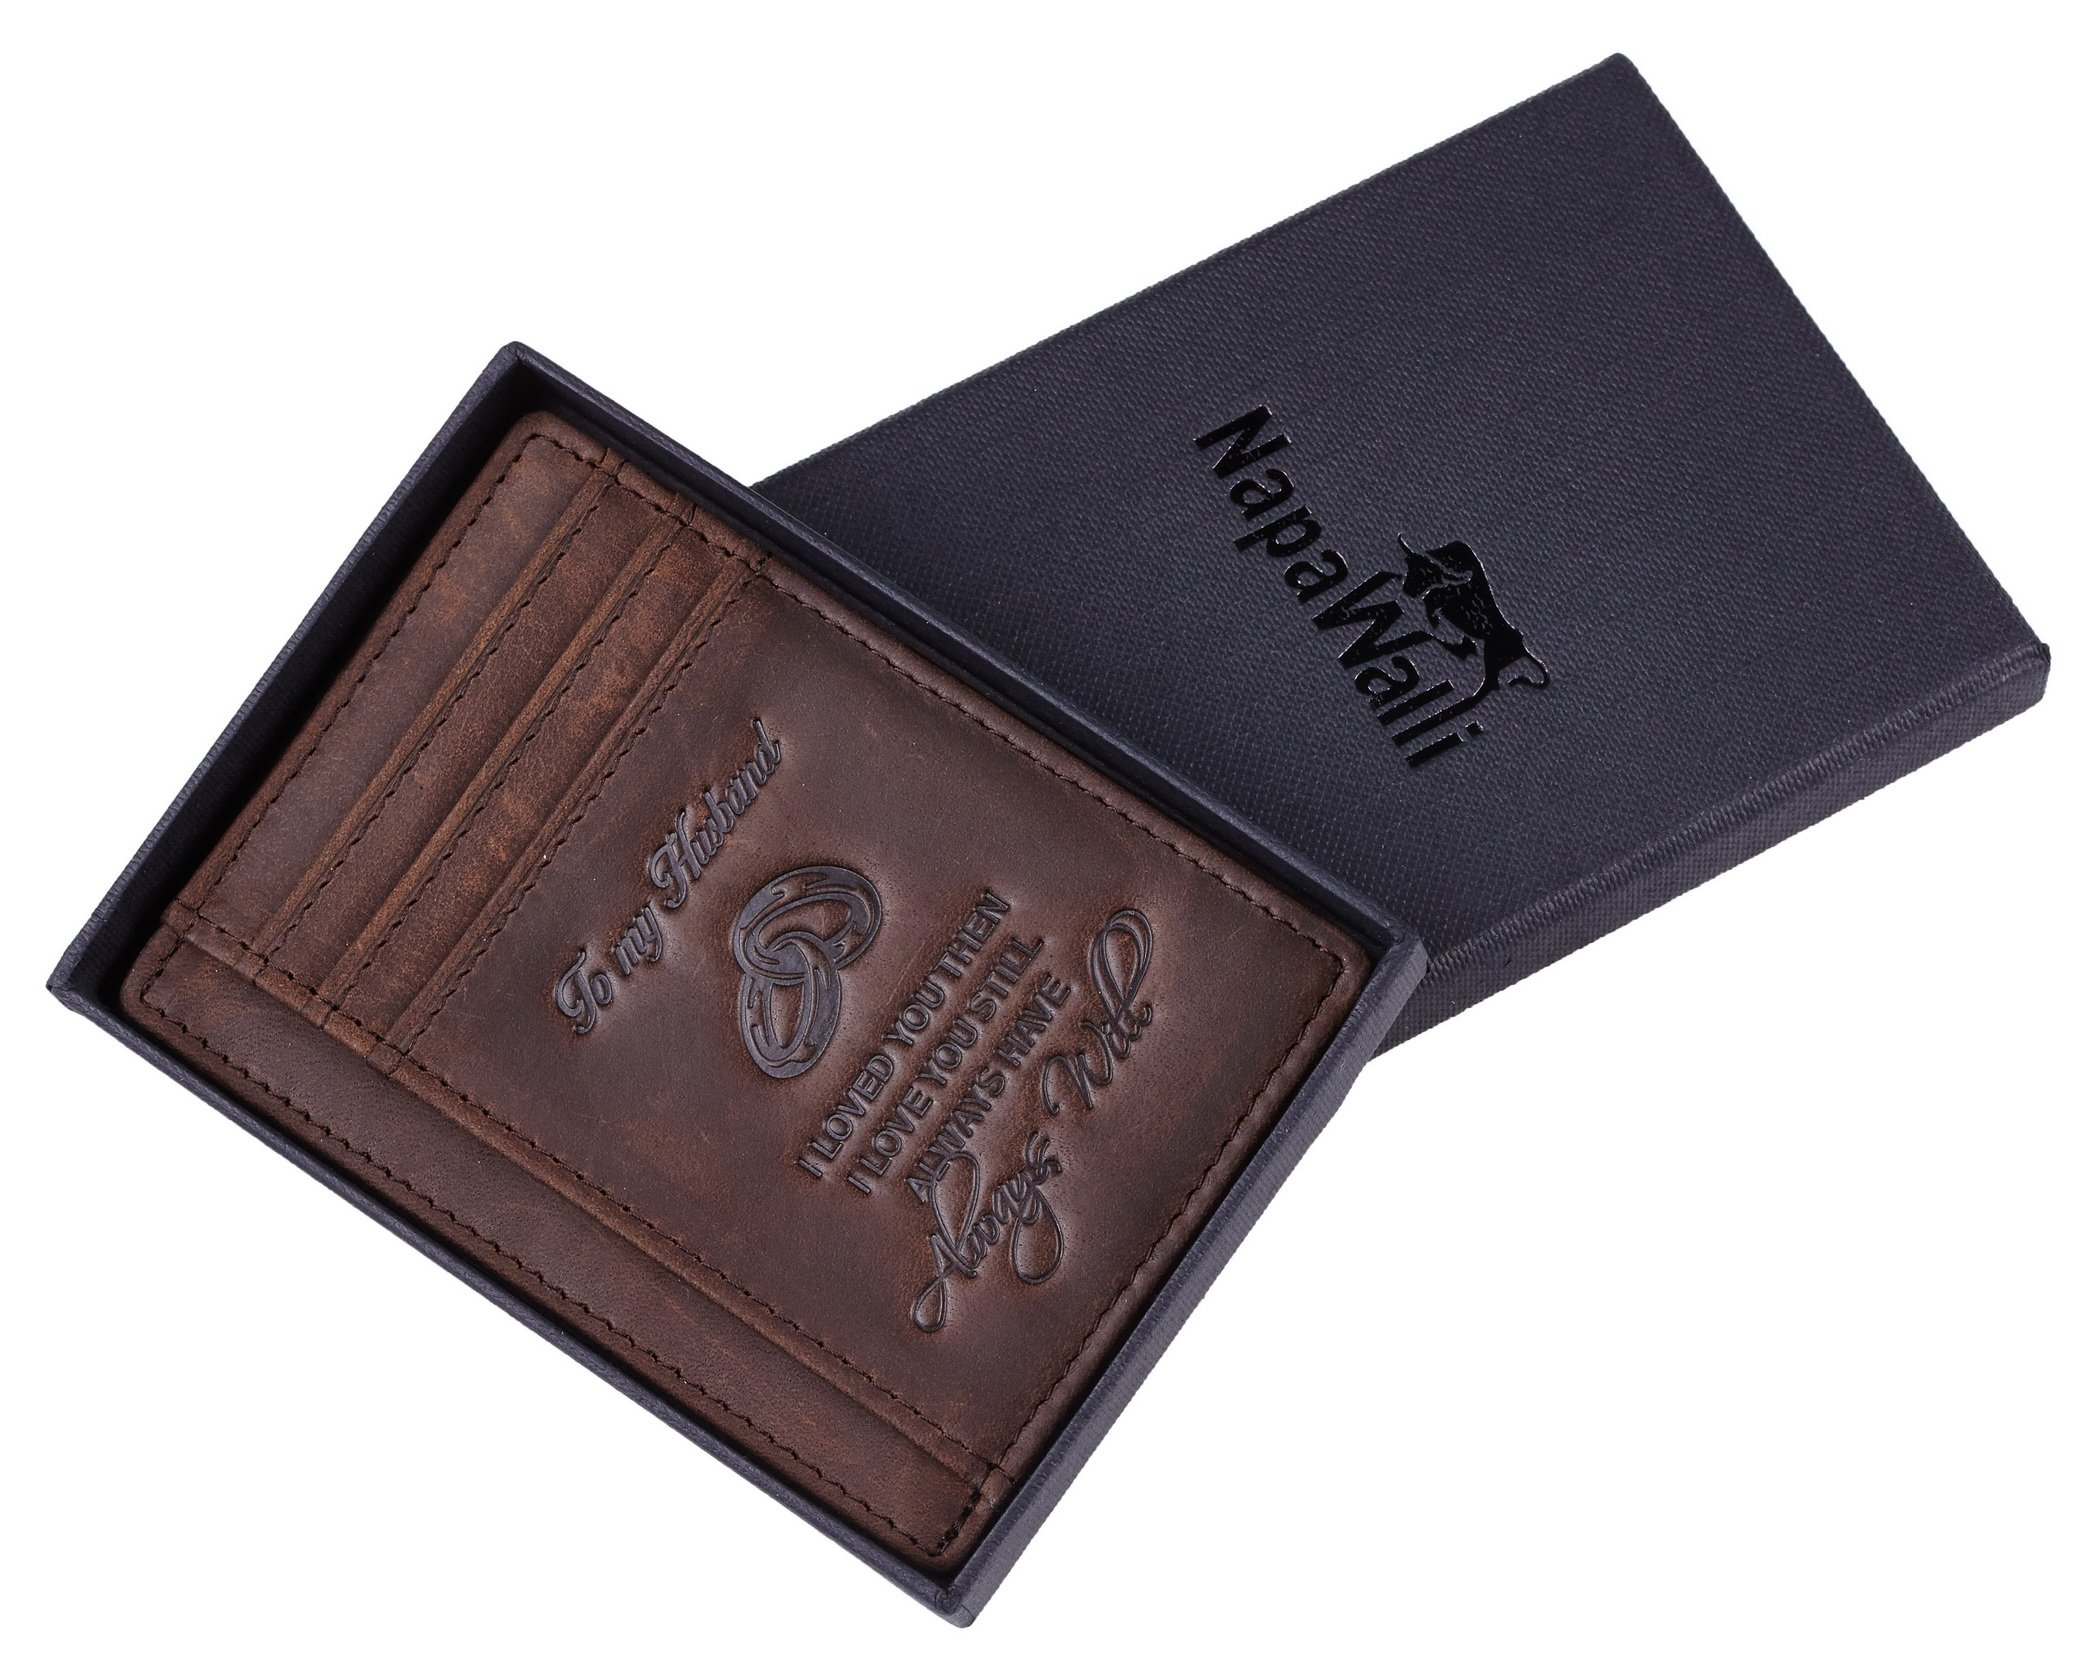 NapaWalli Wife To Husband Gift Best Anniversary Birthday Gifts For Him Genuine Leather RFID Blocking slim Wallet Card Holder (Hunter Coffee) by NapaWalli (Image #5)